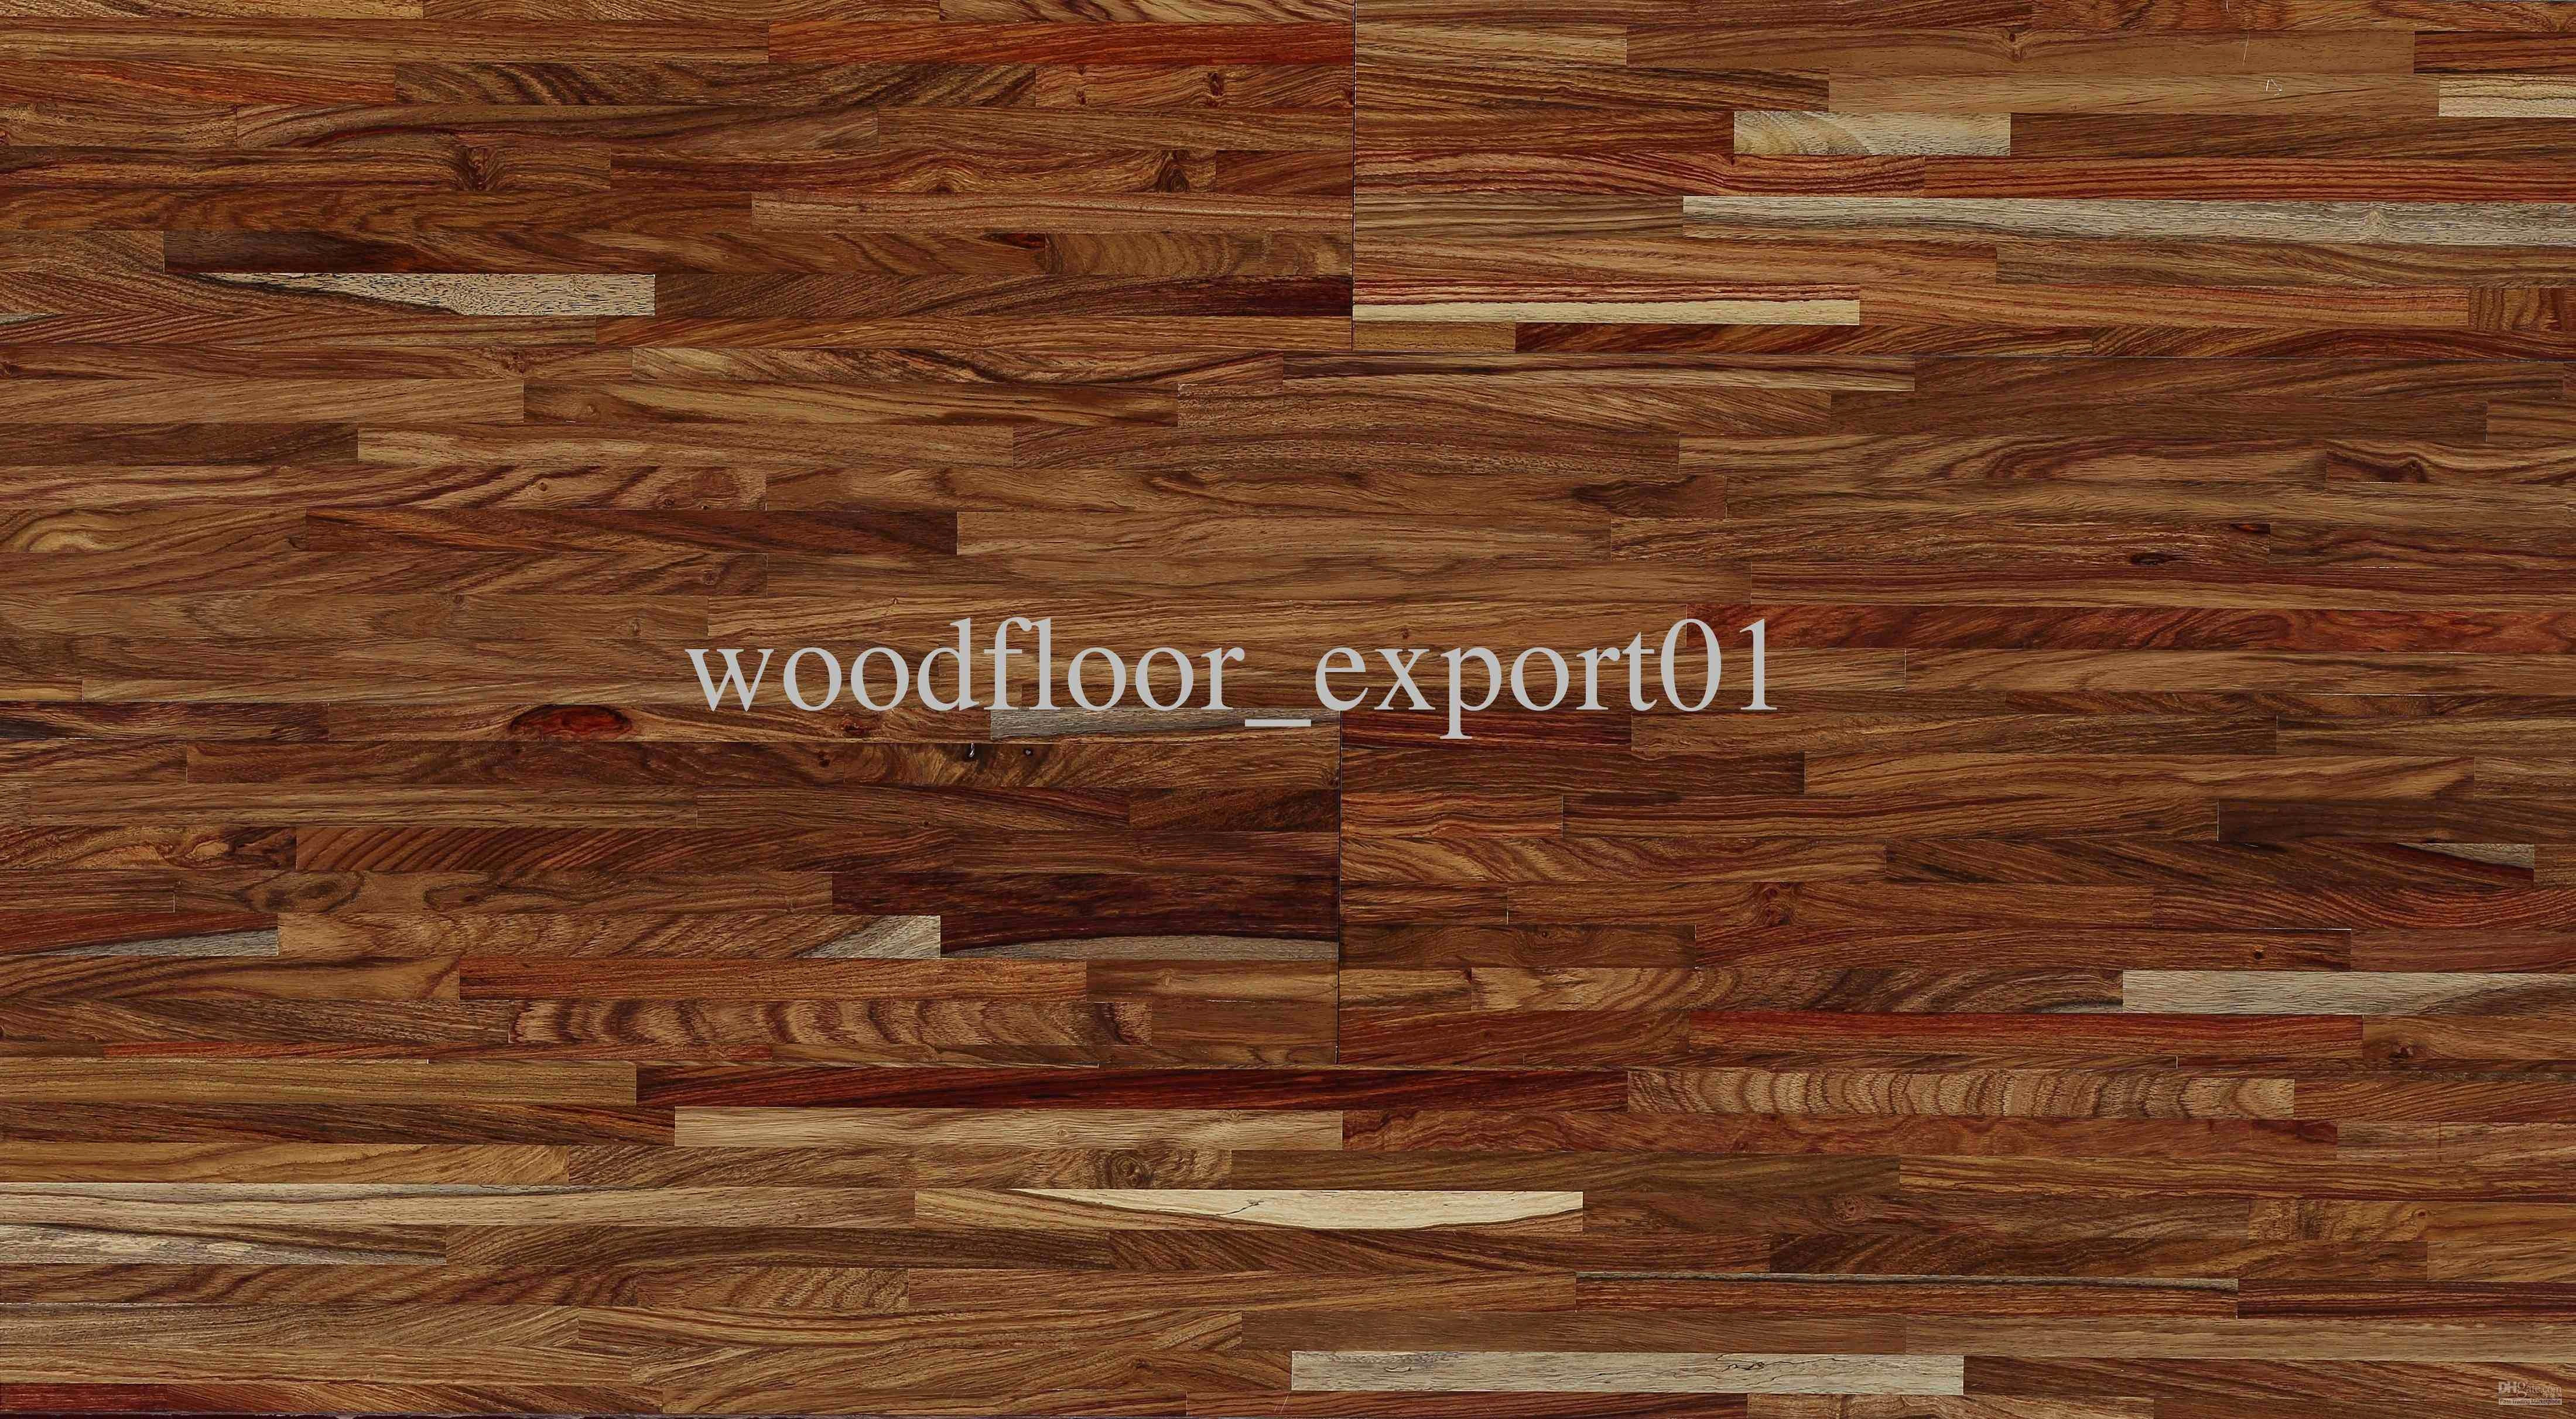 antique hickory hardwood flooring of 15 unique types of hardwood flooring image dizpos com inside types of hardwood flooring awesome 50 inspirational sanding and refinishing hardwood floors graphics image of 15